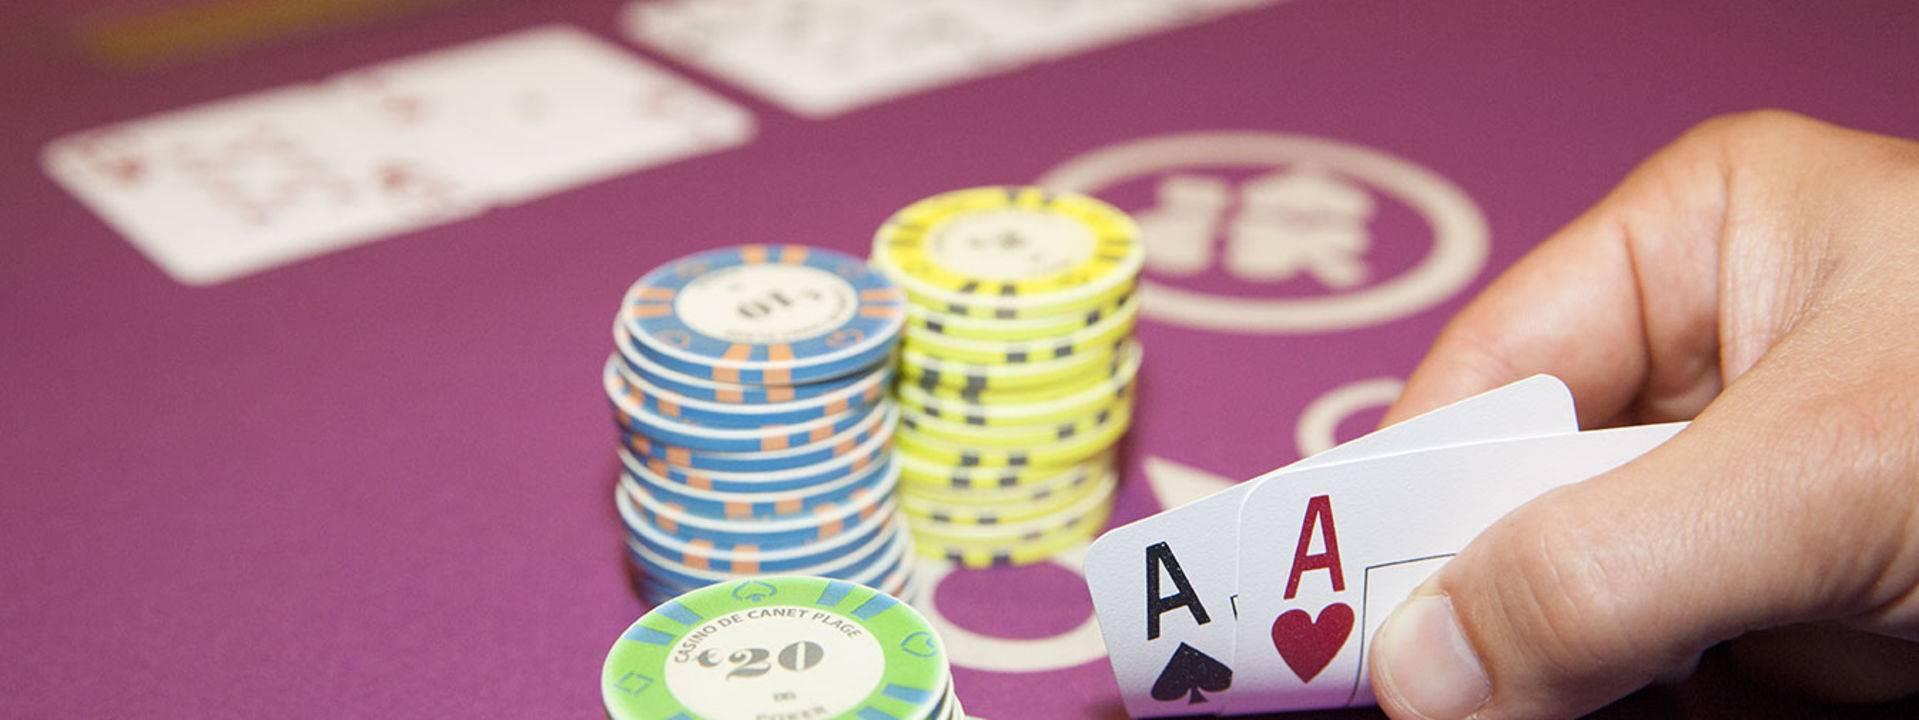 Casino luxeuil poker hot poker games